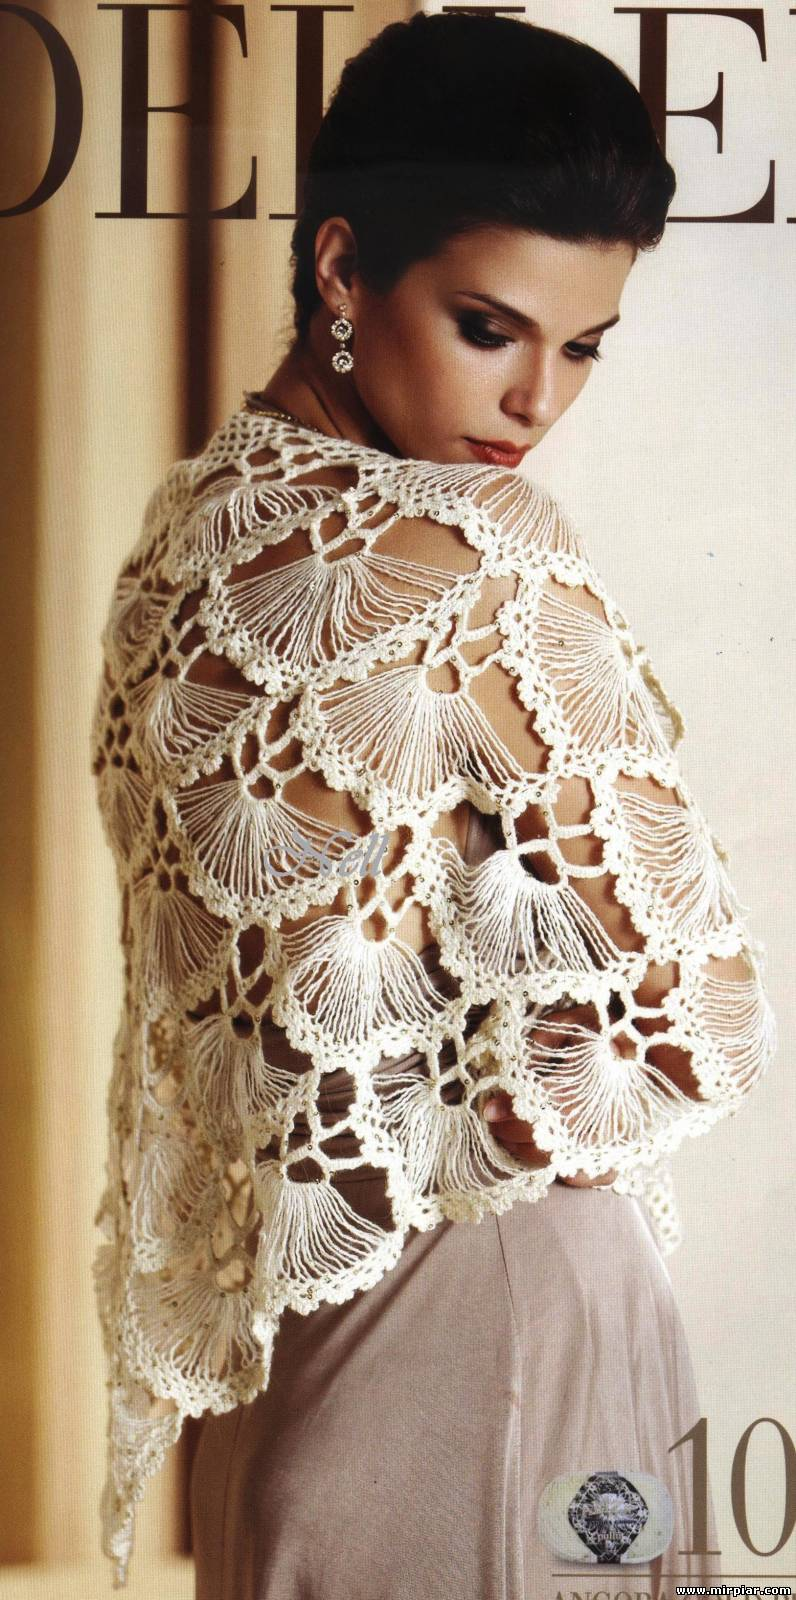 Site De Crochet : s?bado, 2 de agosto de 2014